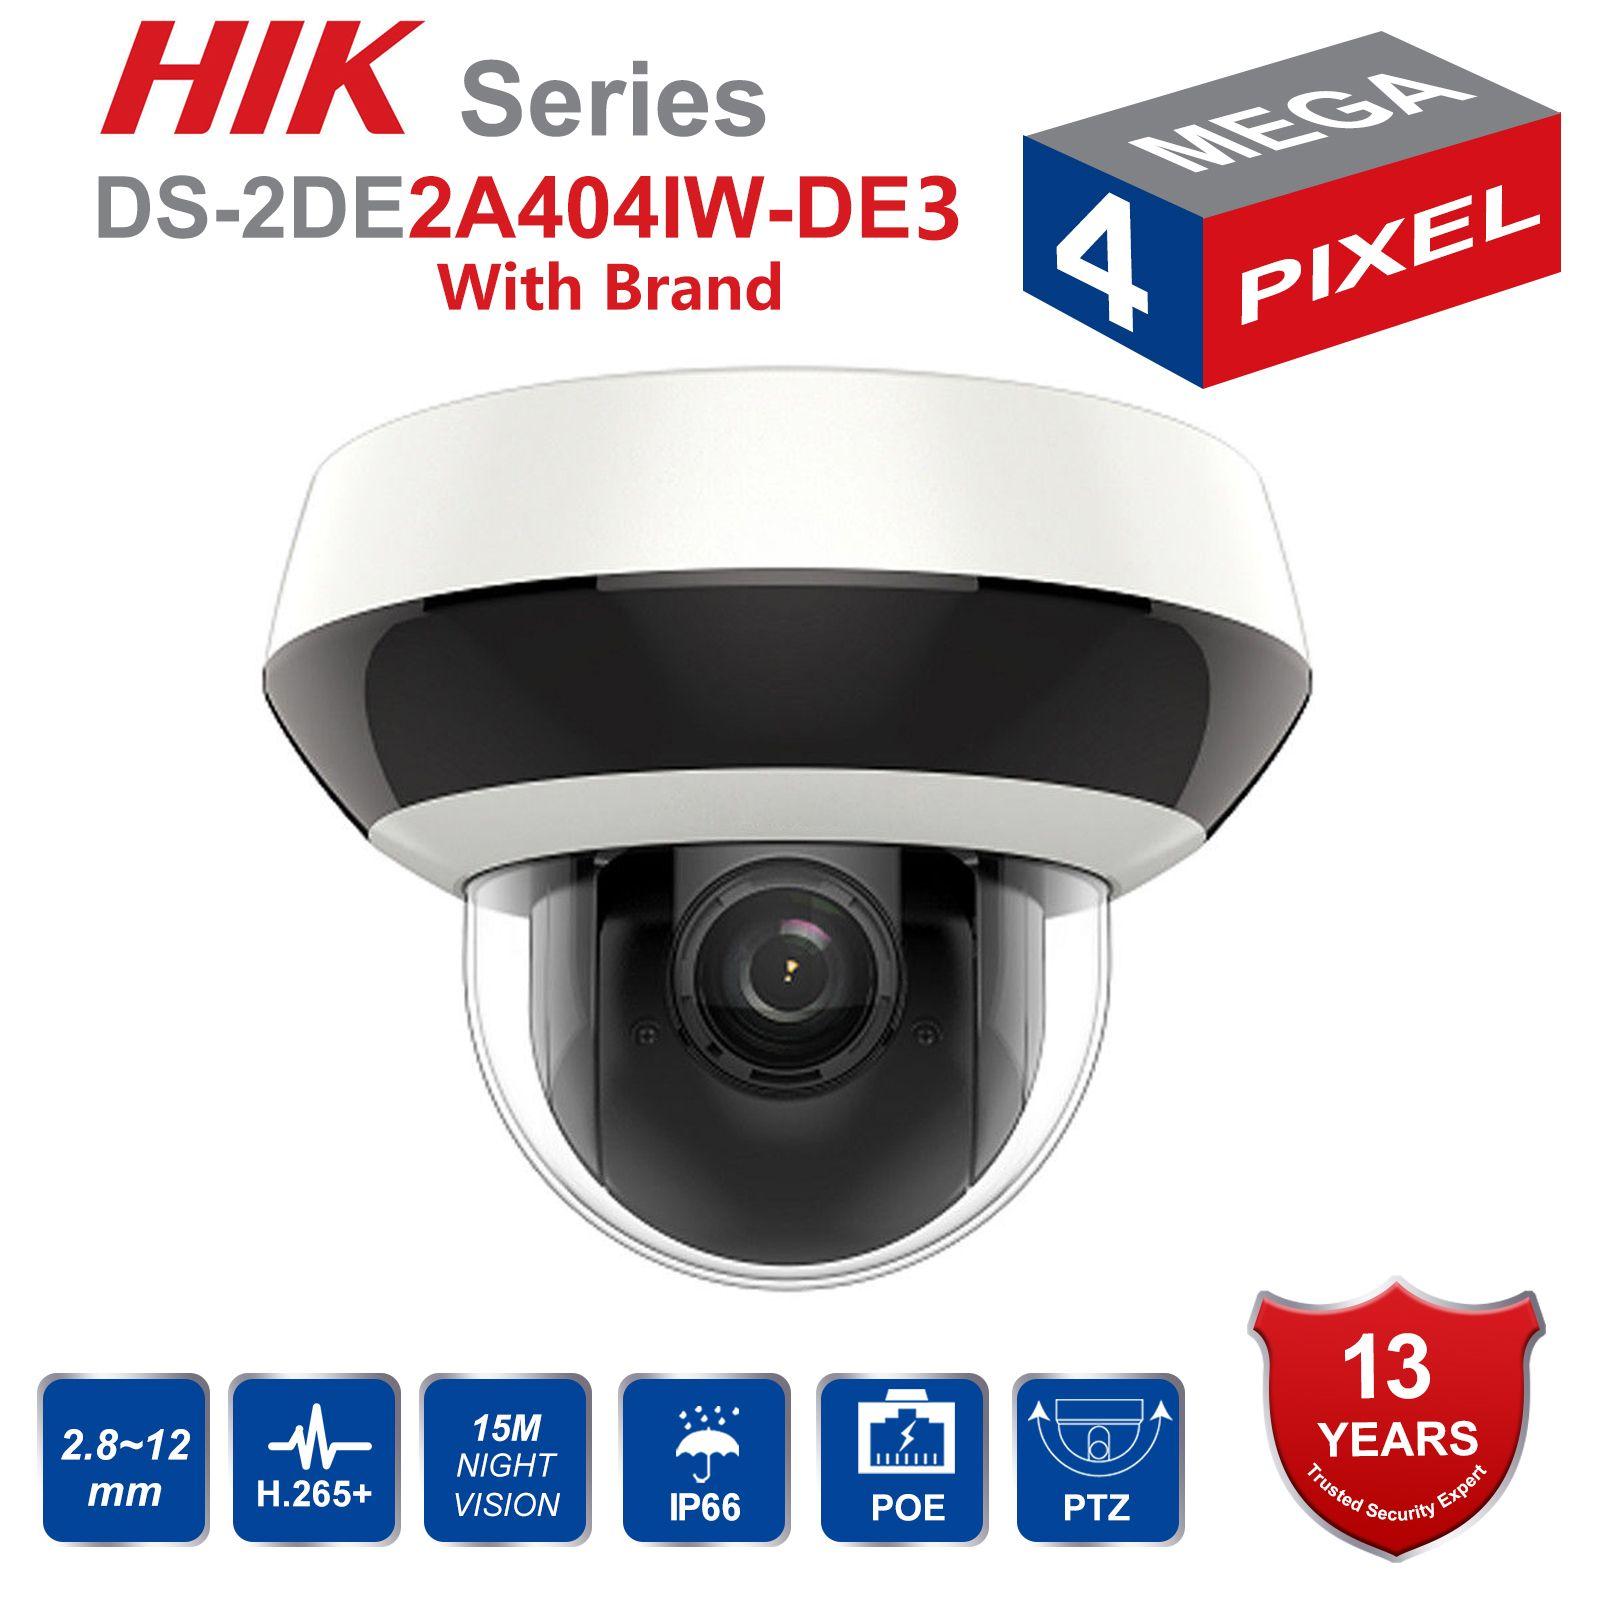 Hik PTZ IP Kamera H.265 DS-2DE2A404IW-DE3 4MP 4X Zoom 2,8-12mm objektiv Netzwerk Video Überwachung POE Dome CCTV kamera Audio